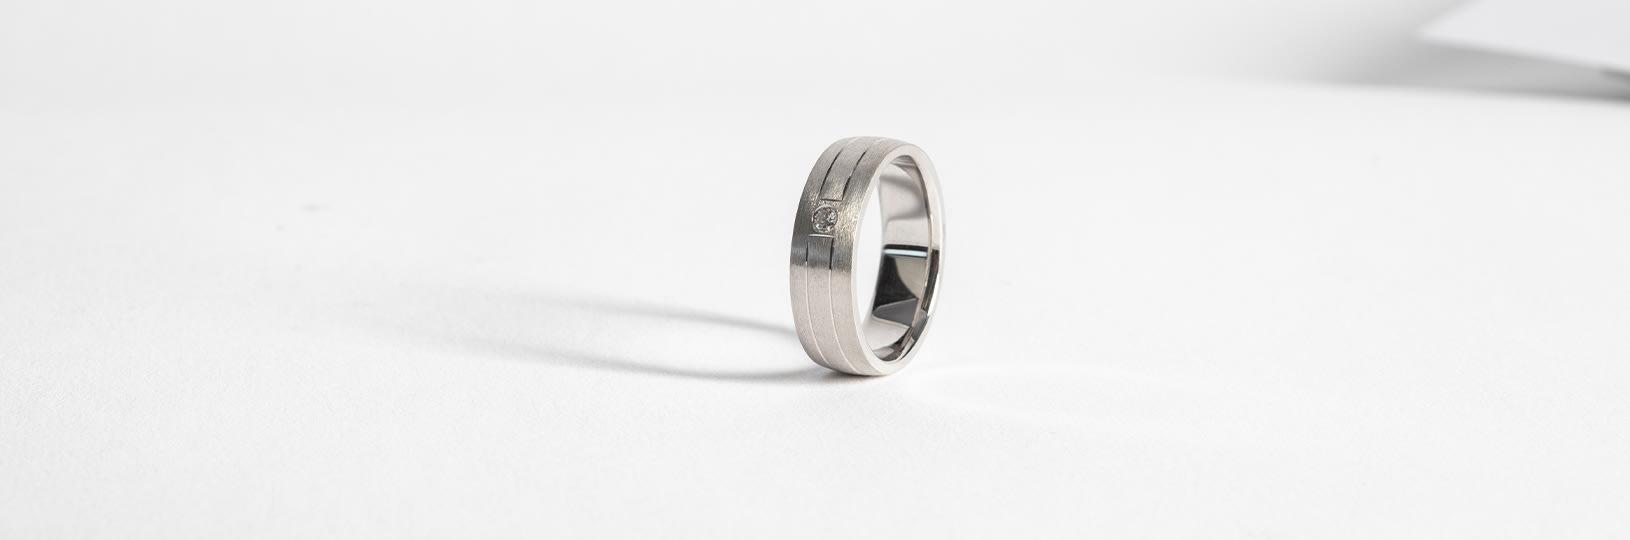 Men's classic wedding ring